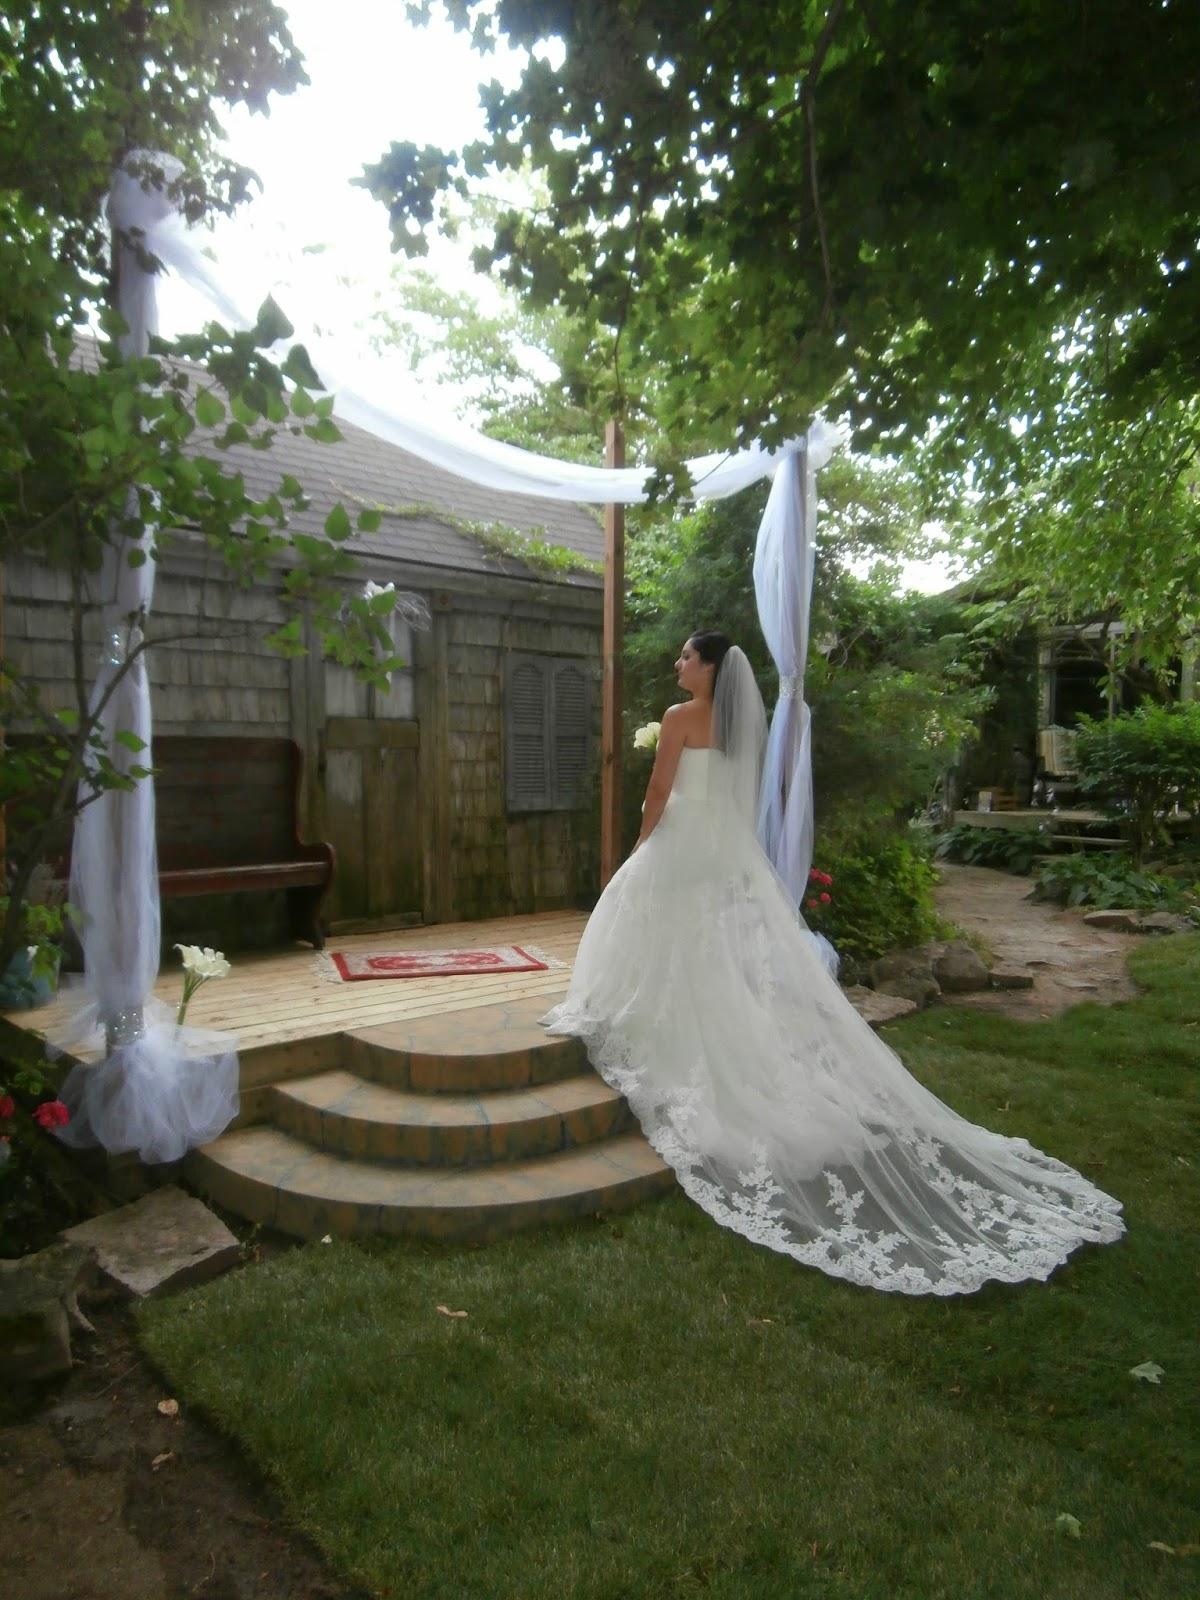 Niagara Falls Elopements And Destination Wedding Chapel On The Lane August 2014